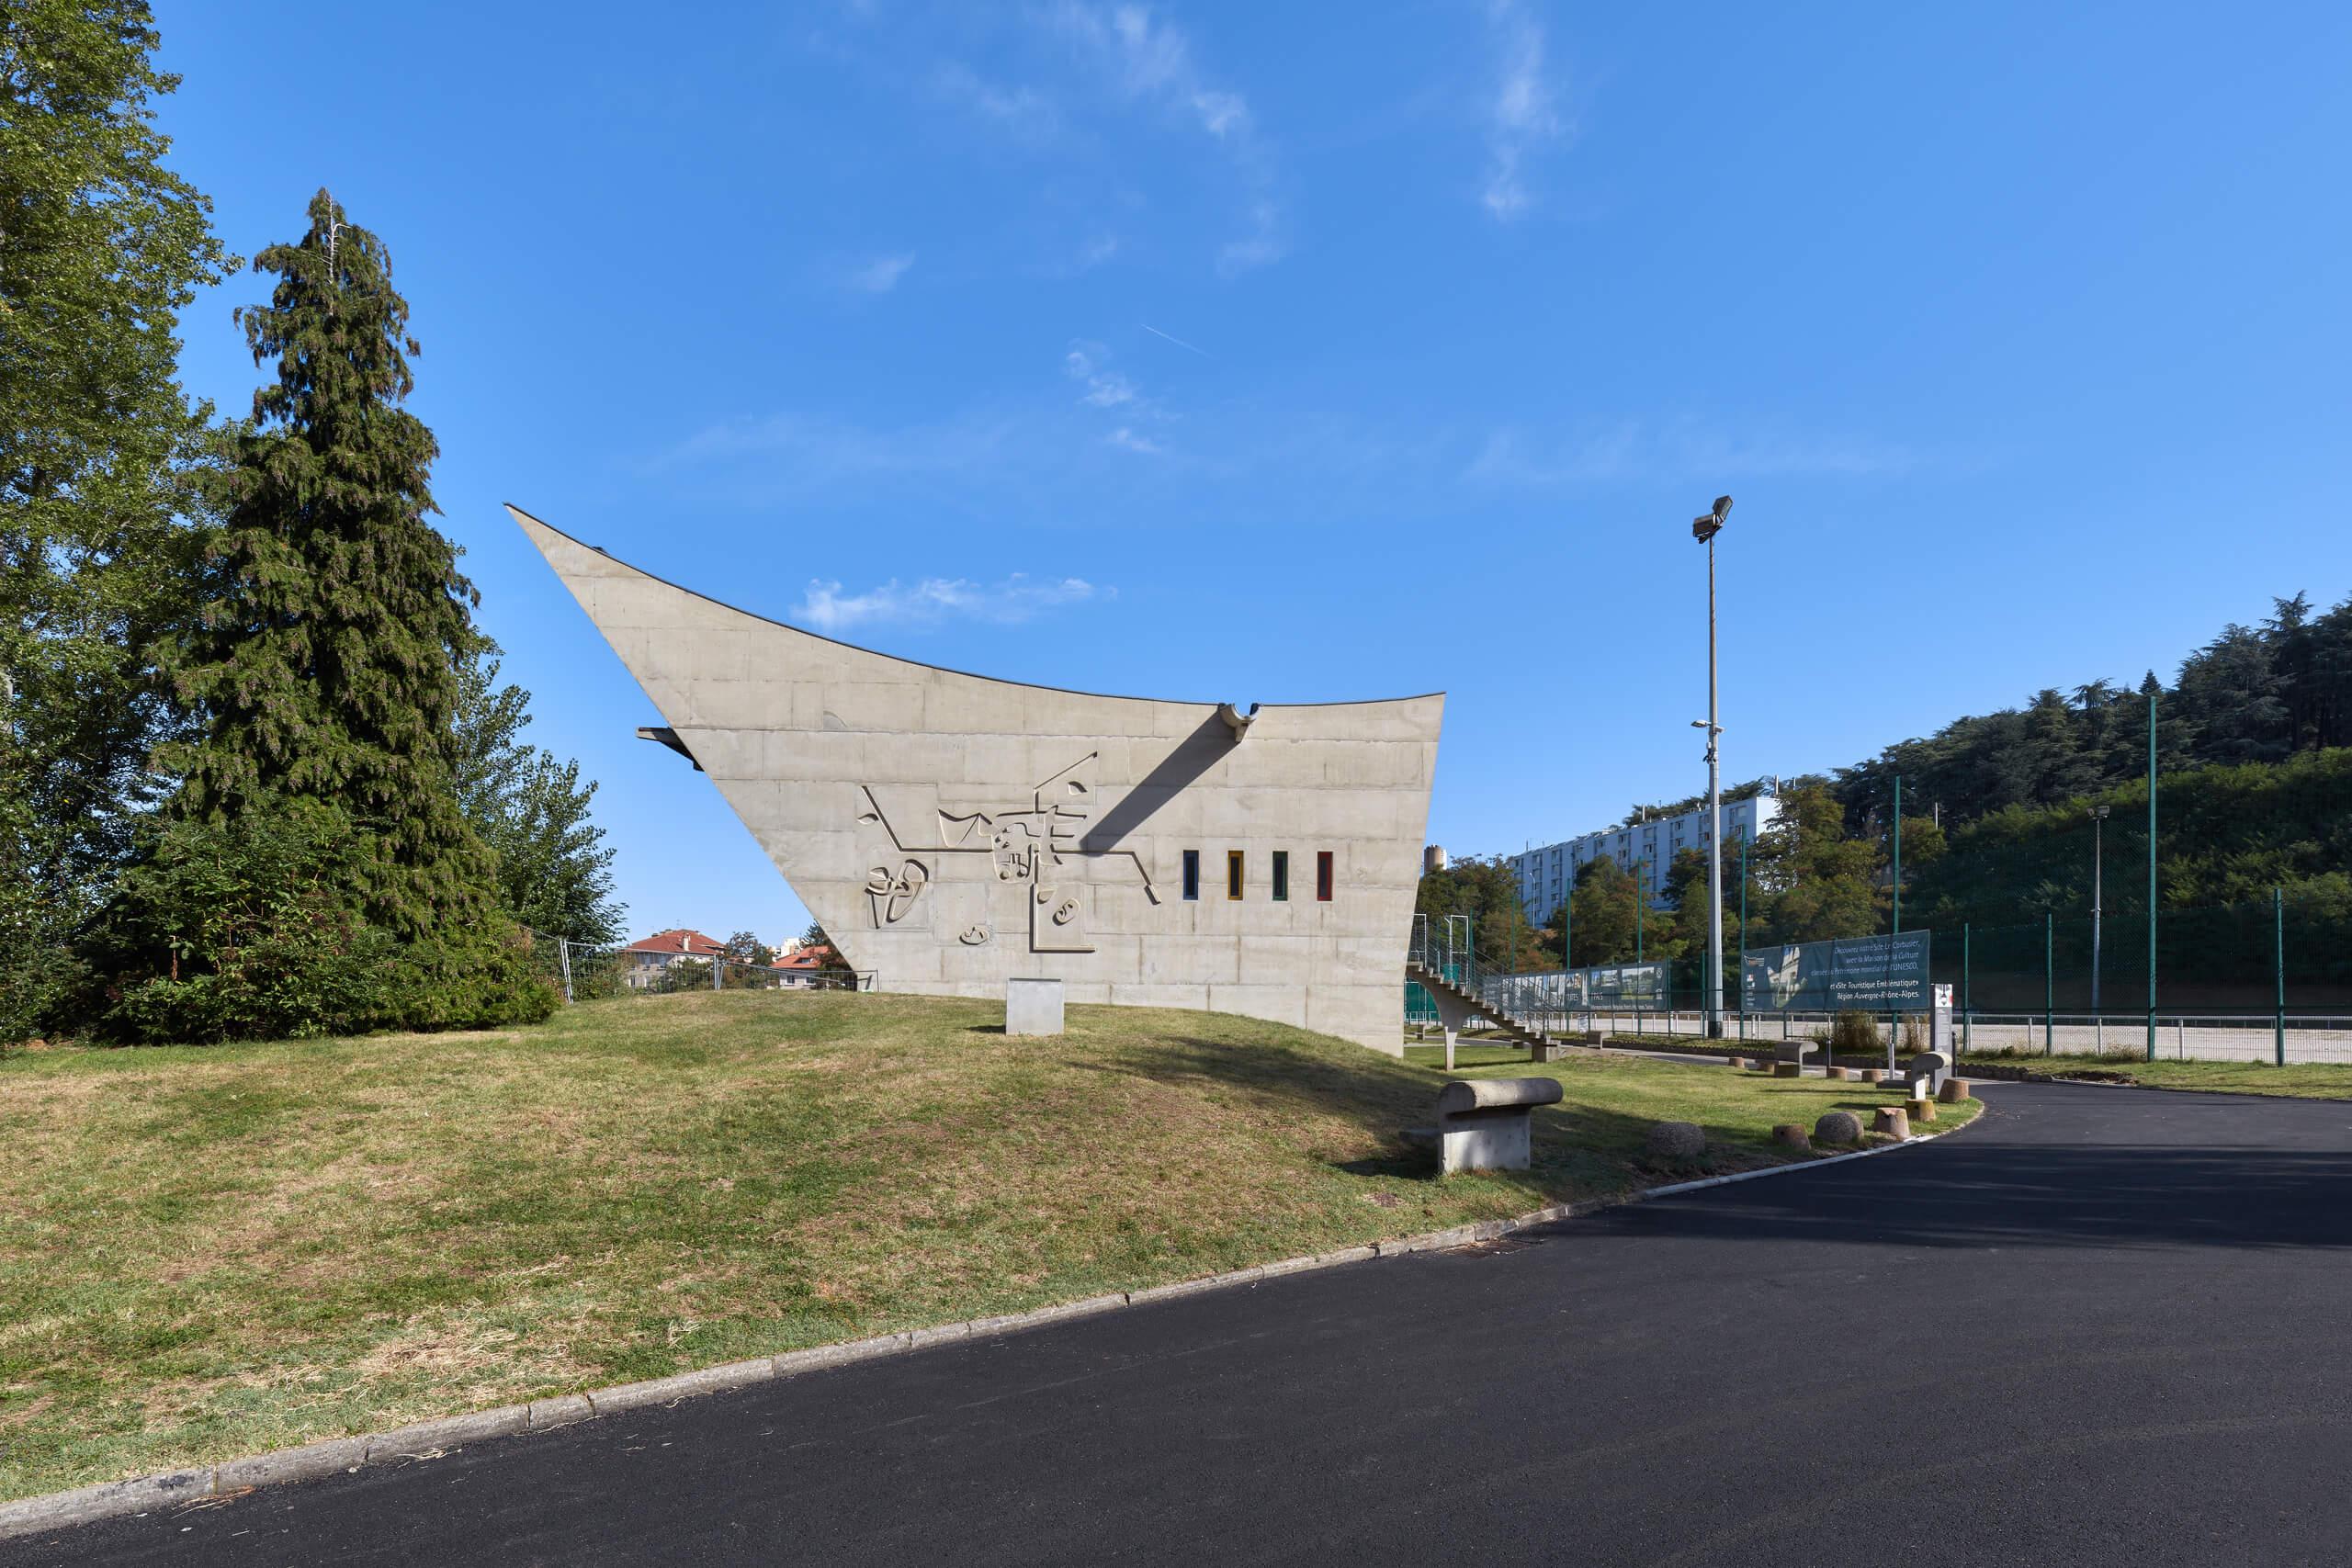 Federico_Covre_Le_Corbusier_Stadium_Firminy_2018_01